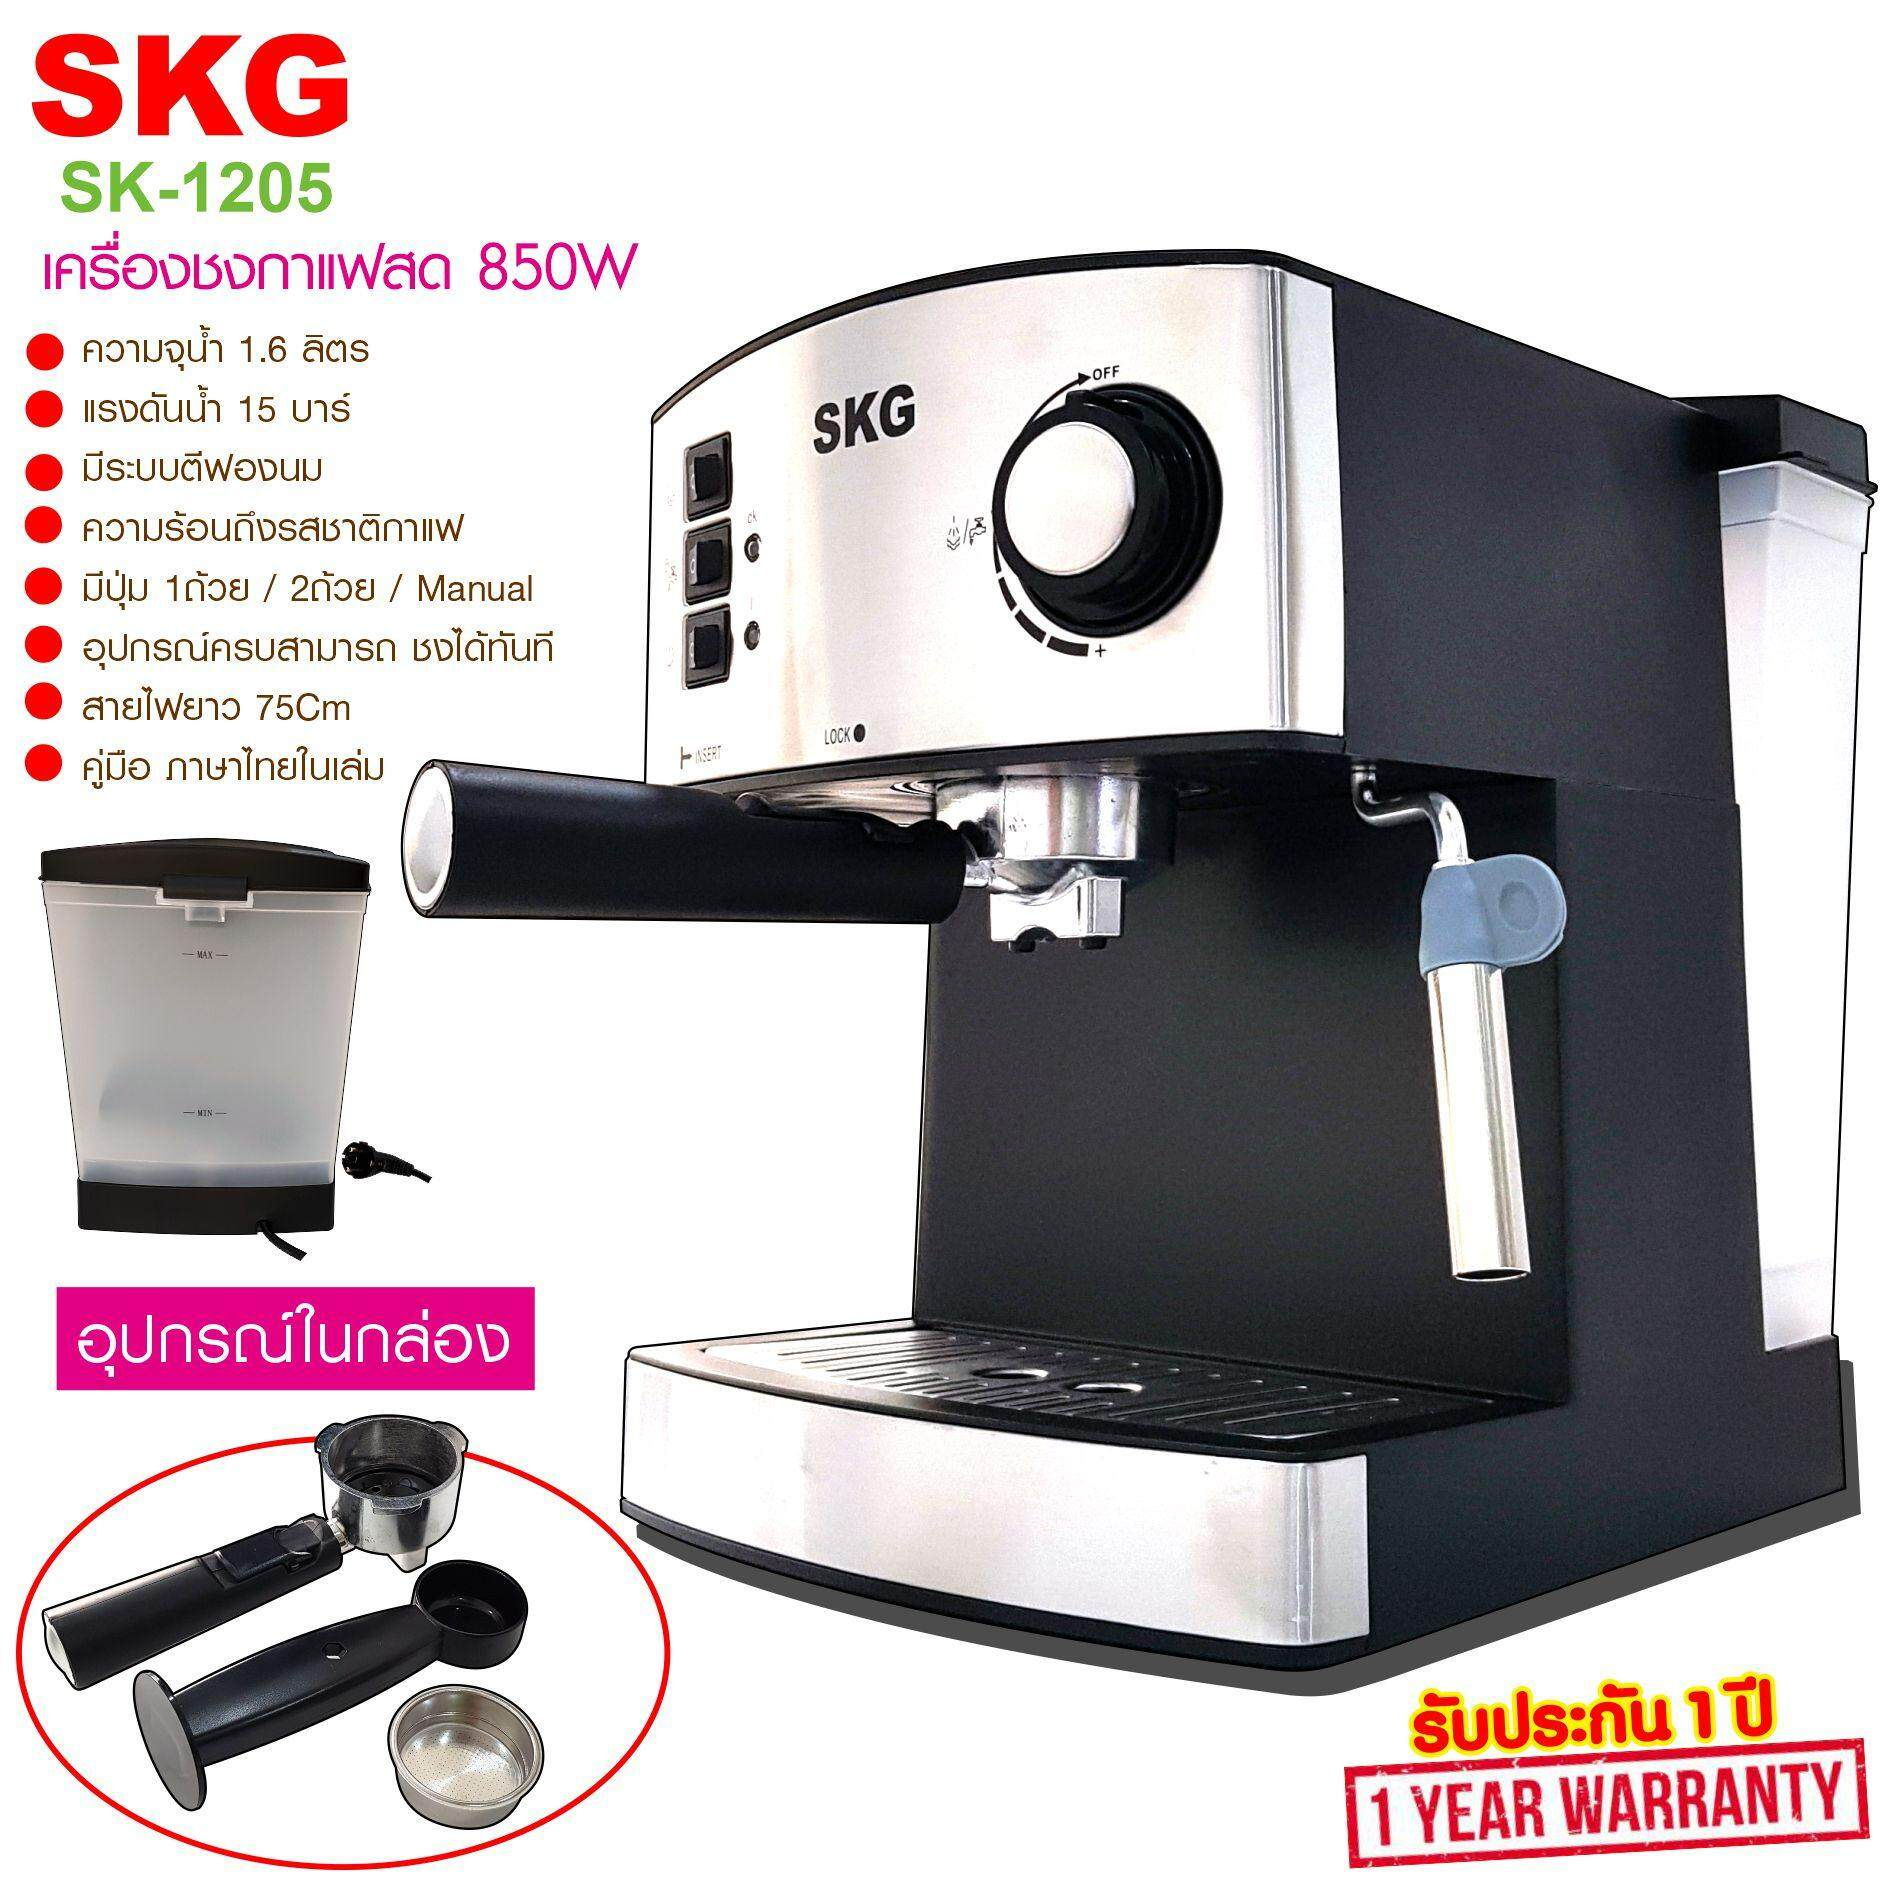 SKG เครื่องชงกาแฟสด 850W 1.6ลิตร รุ่น SK-1205 สีเงิน  - b38e401b03ff743ca86fff3896eb0f86 - ทดสอบเครื่องชงกาแฟสด Duchess CM 3000